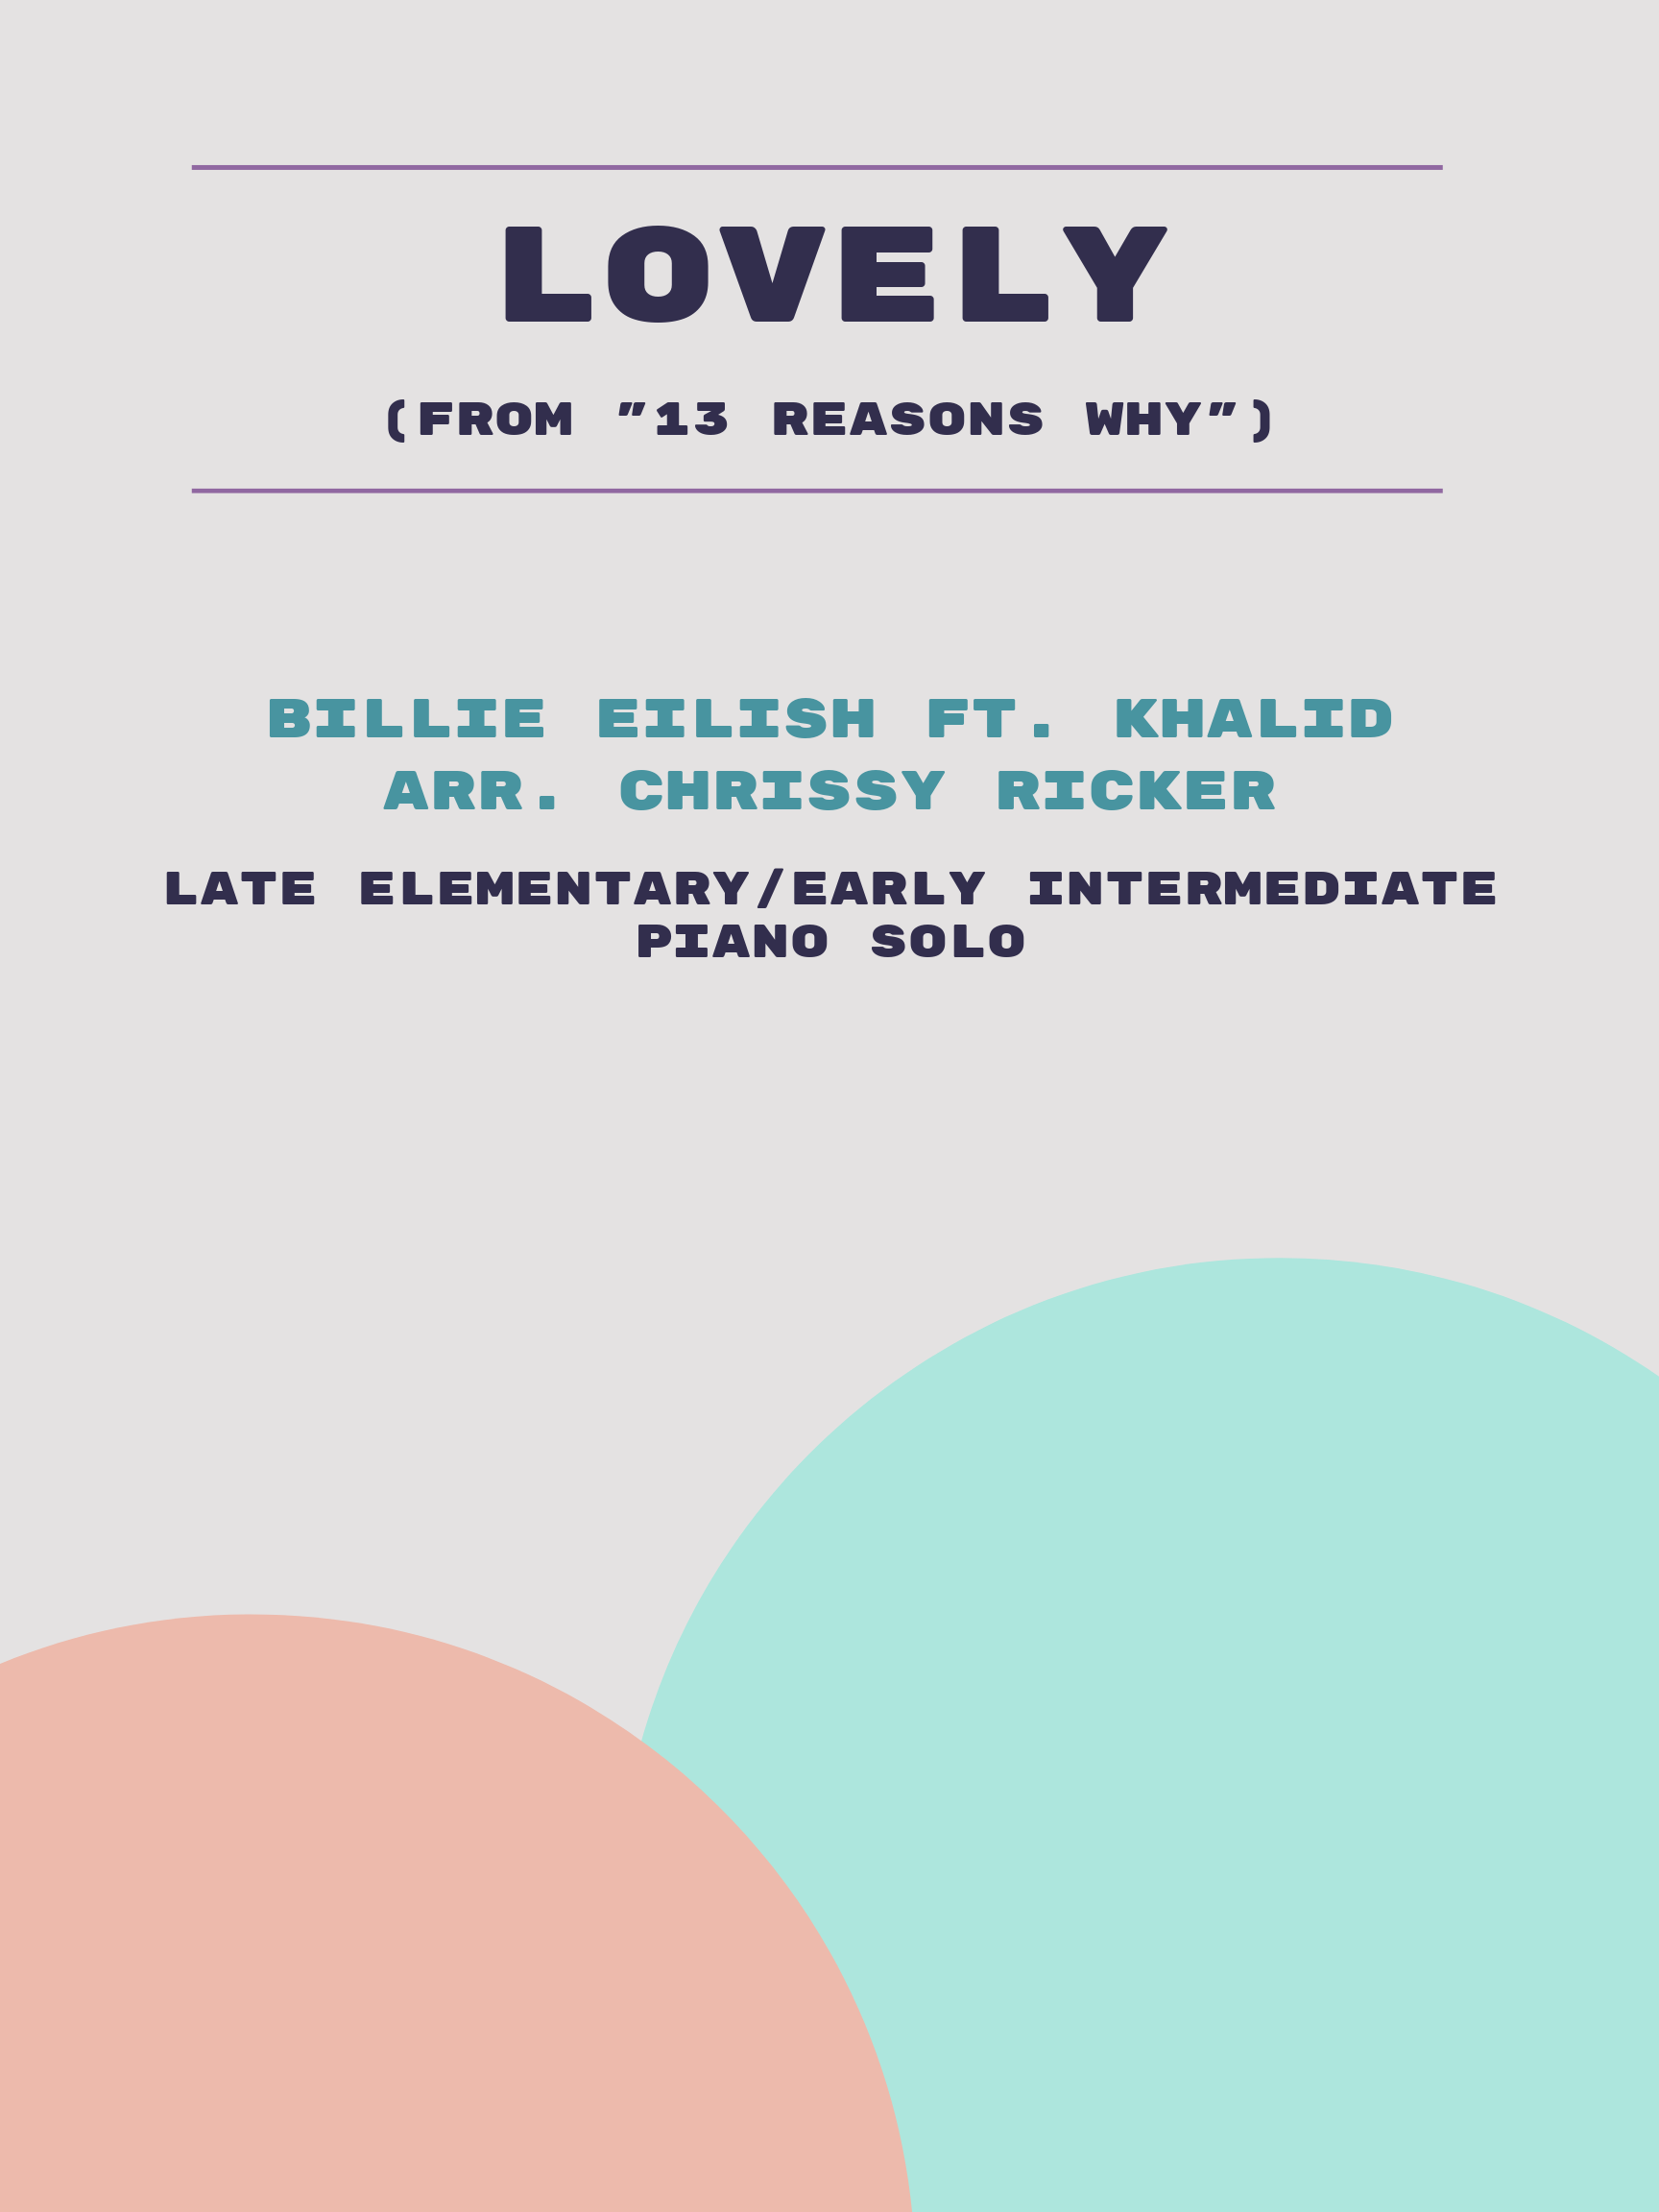 lovely by Billie Eilish ft. Khalid